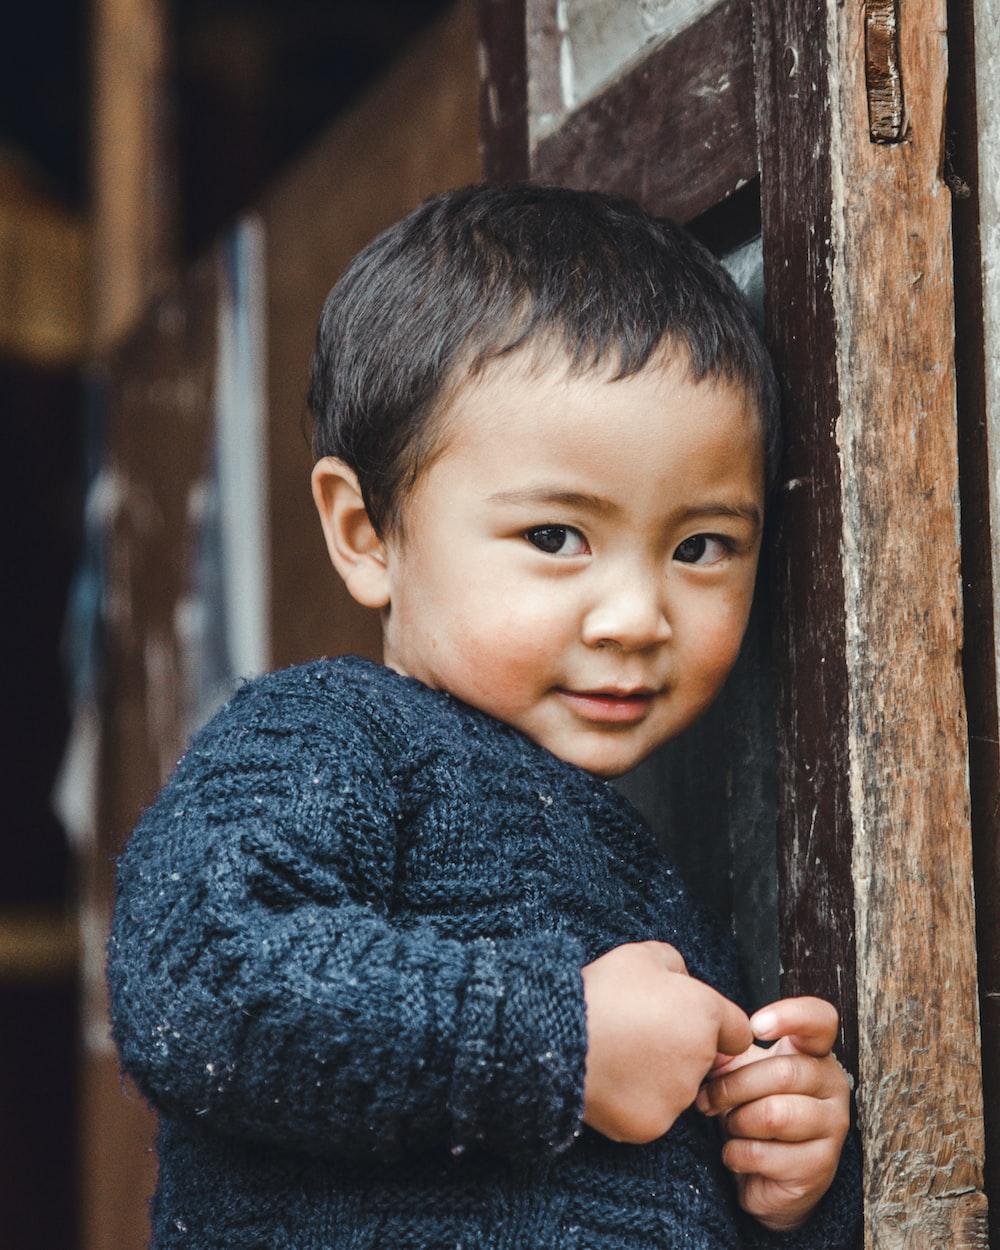 toddler in black sweater